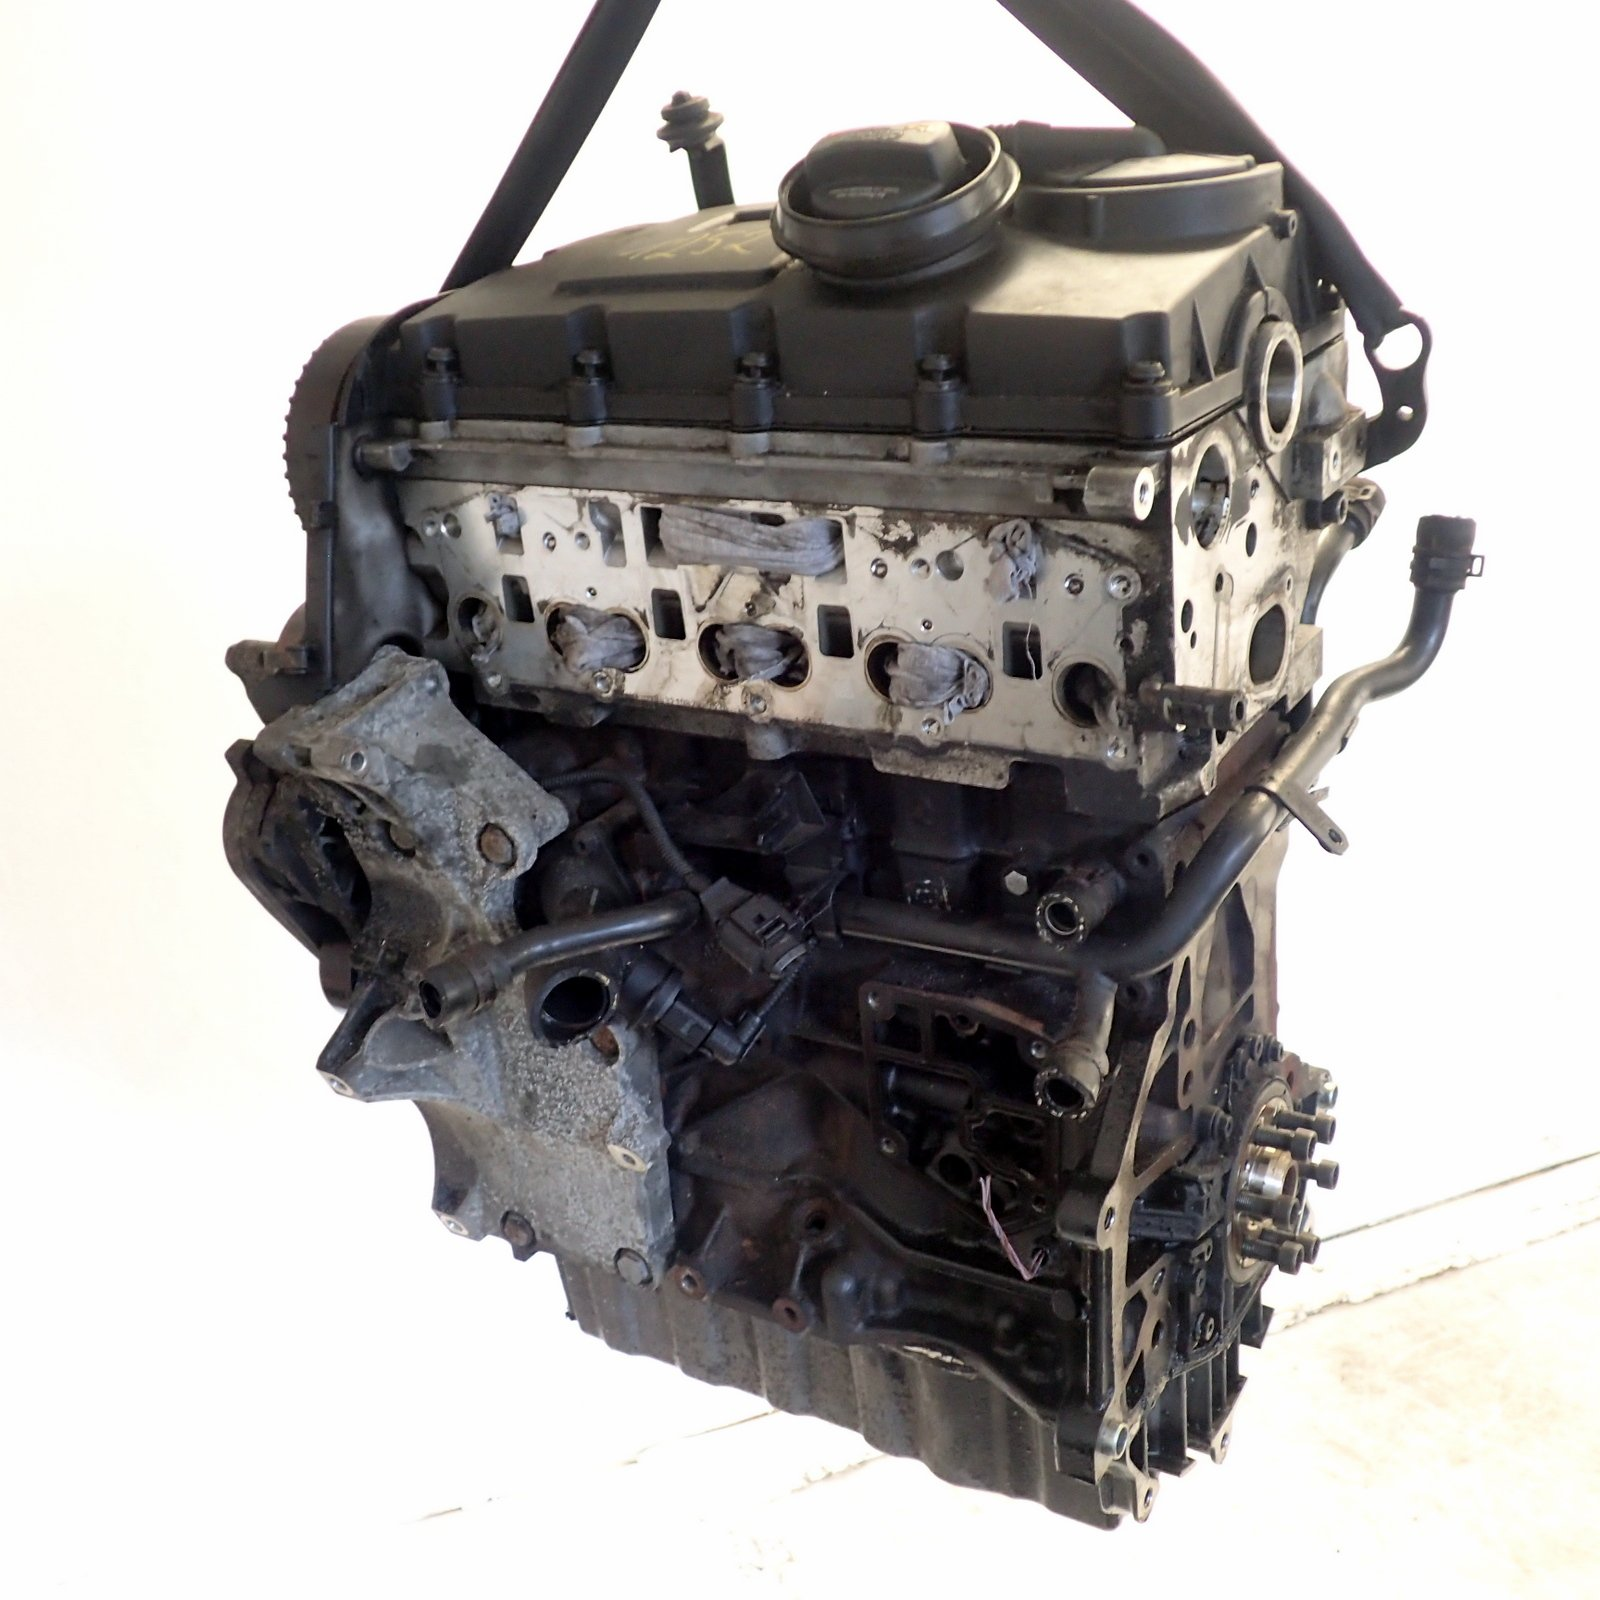 Engine-Bare-BKD-Ref-1252-VW-Touran-mk1-2-0-Tdi thumbnail 3